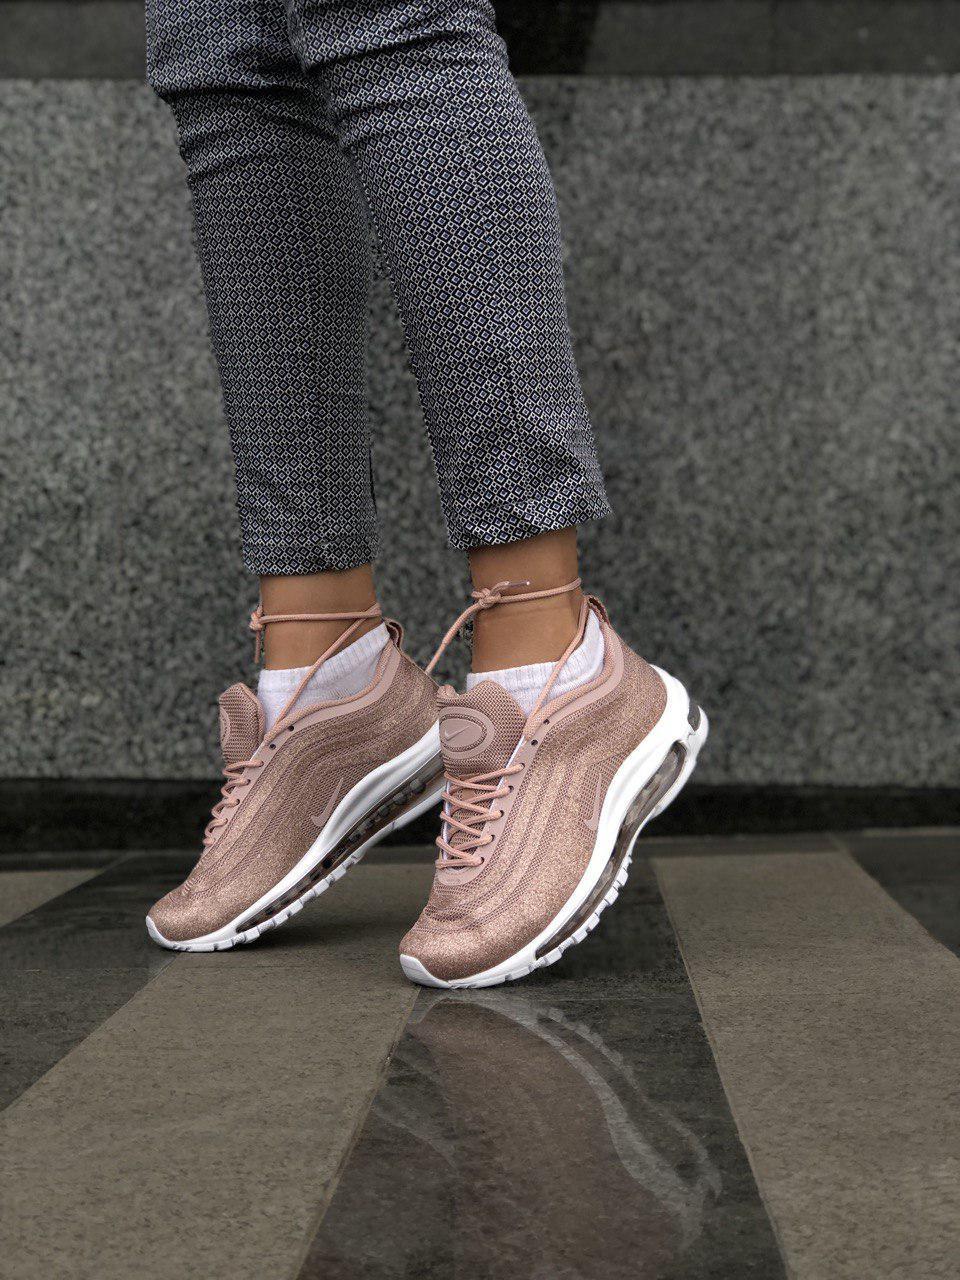 09a5ff25 Кроссовки в стиле Nike Air Max 97 LX Swarovski Pink женские: фото ...